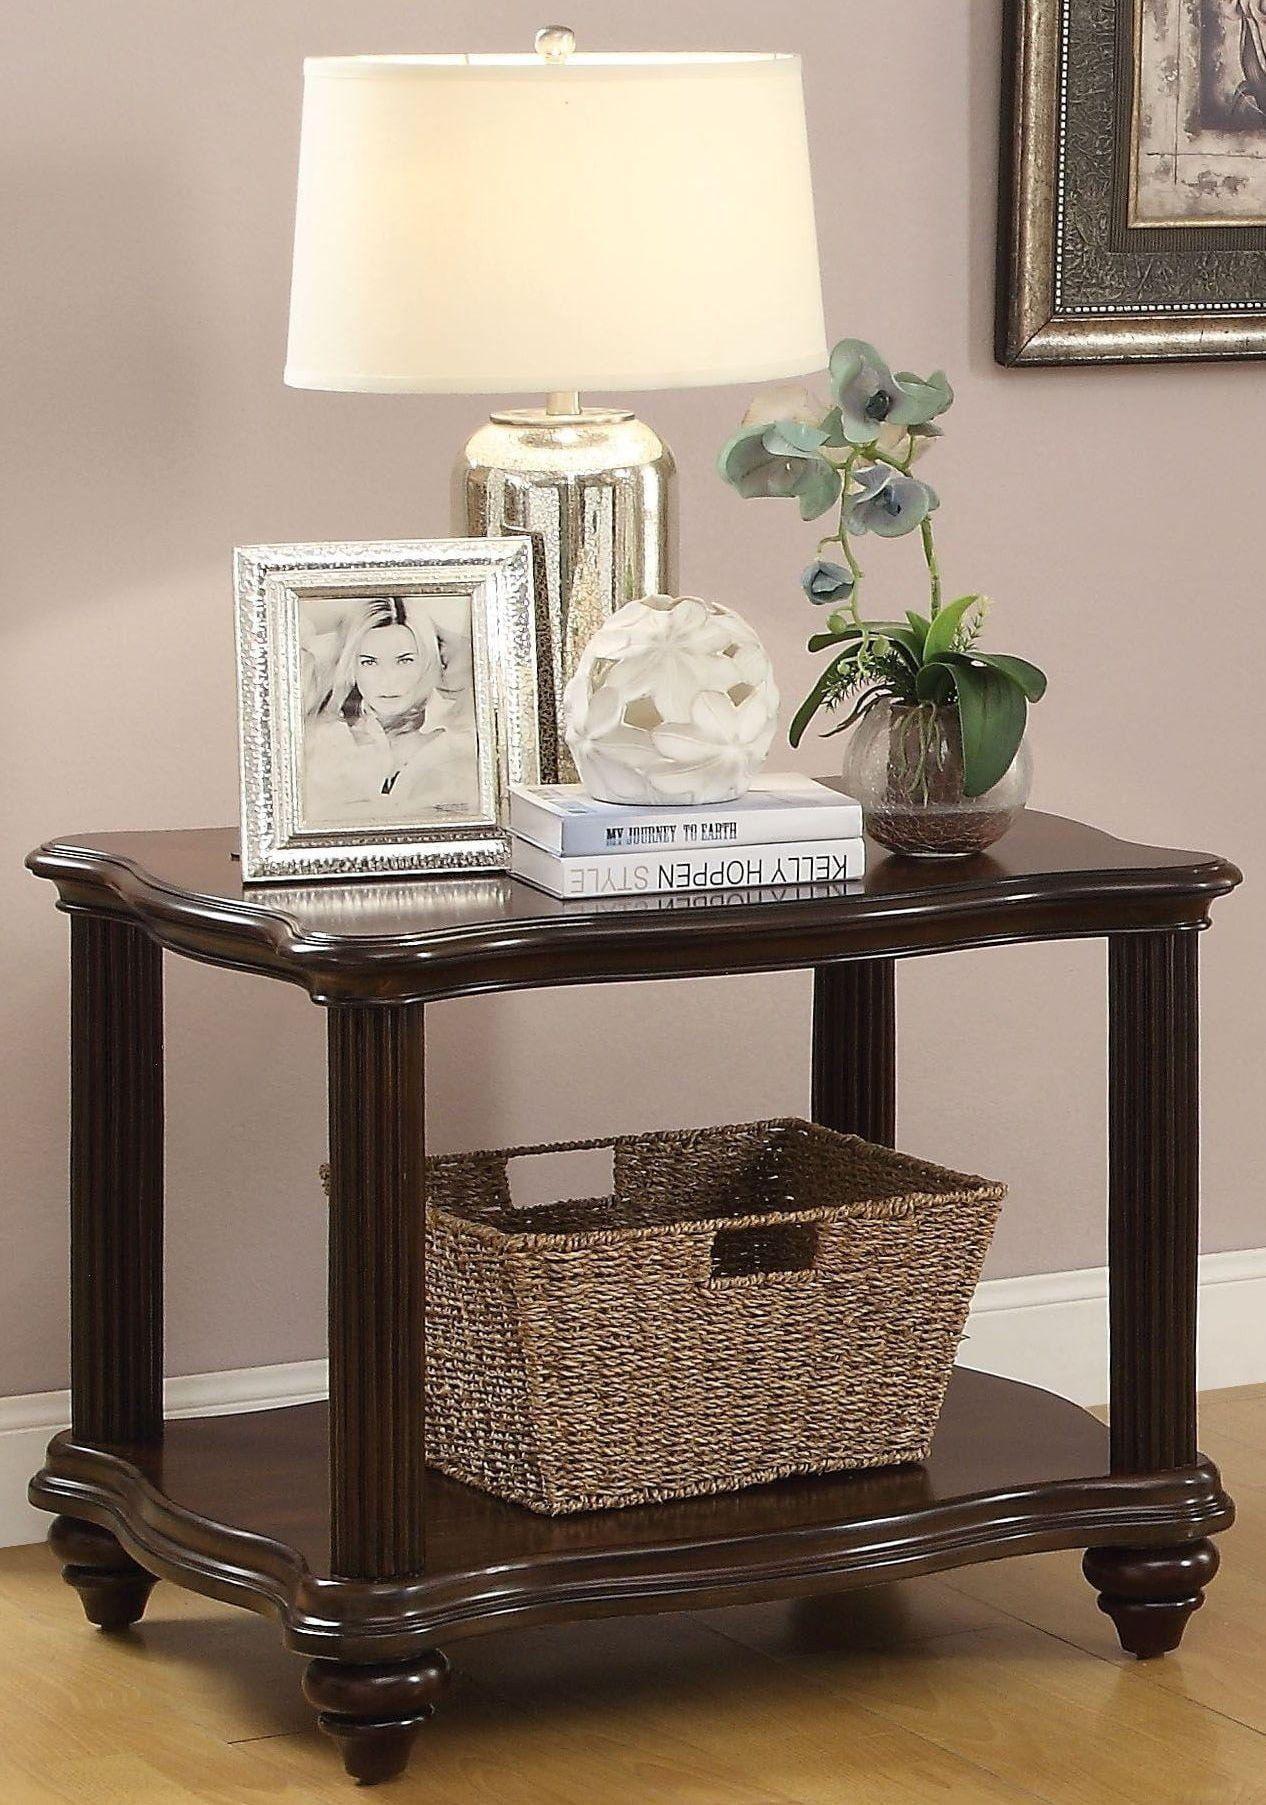 wooden end table with lower shelf dark walnut brown